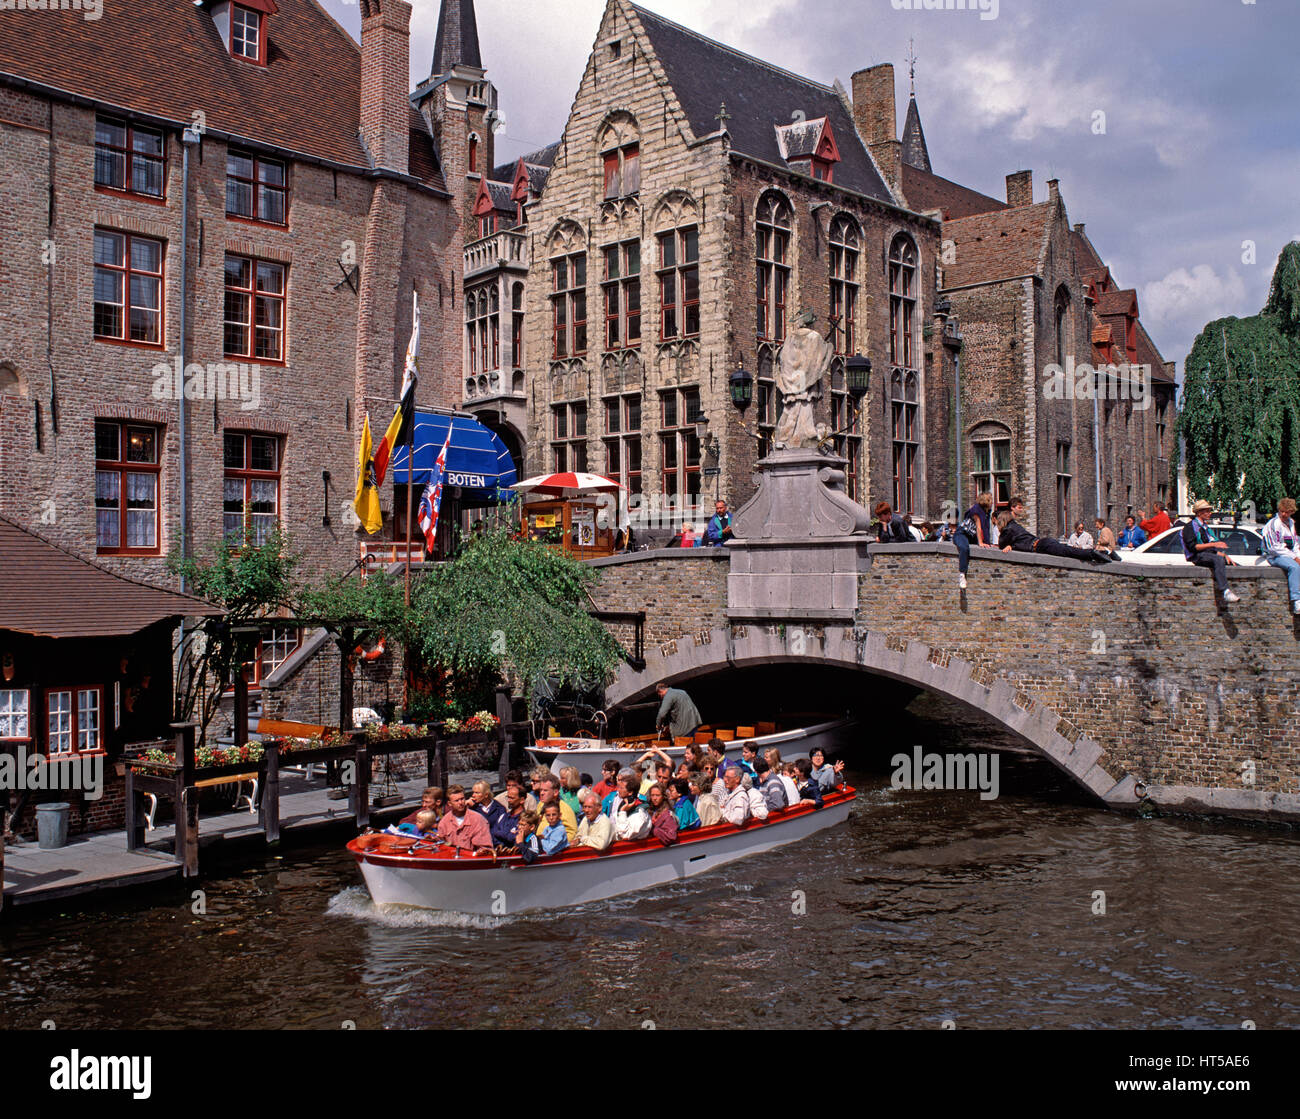 Tourist boat passing under a bridge over the Dijver Canal, Bruges, Belgium. - Stock Image